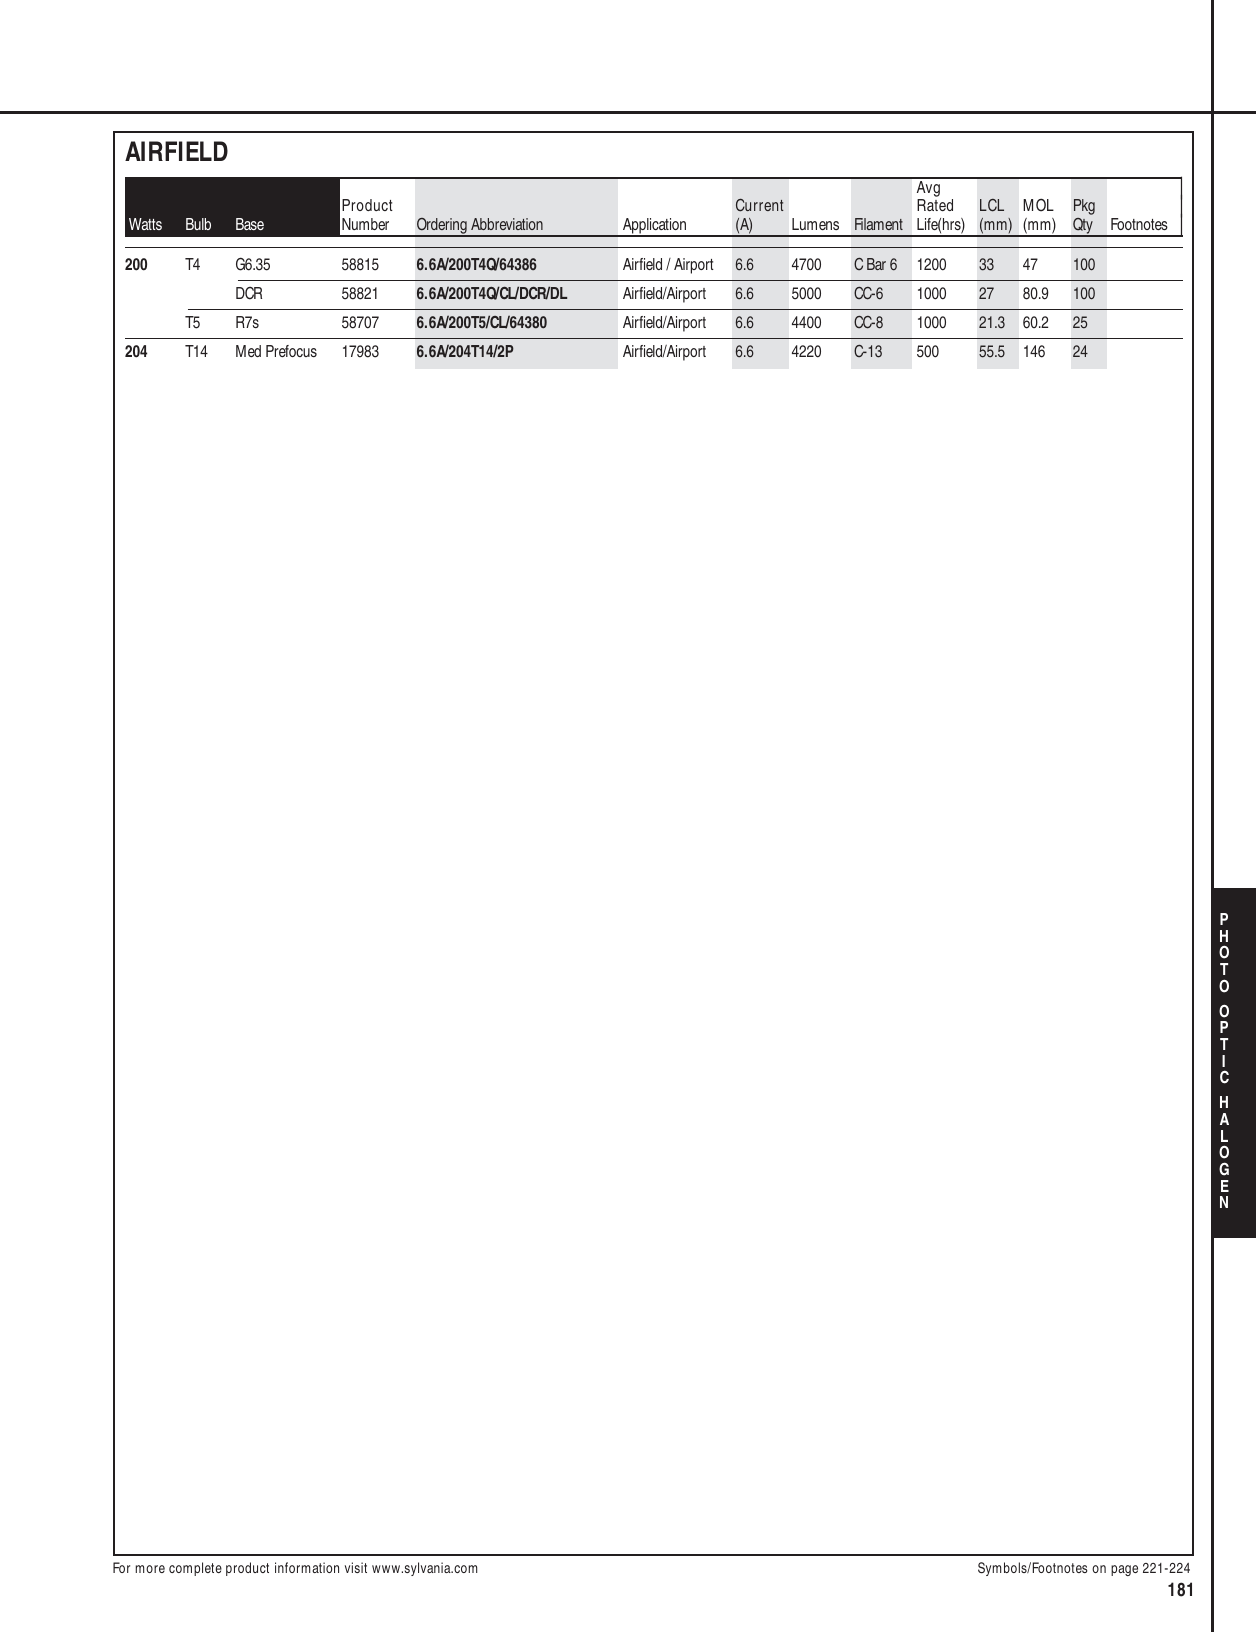 COMPAXE CWA-1200 WINDOWS DRIVER